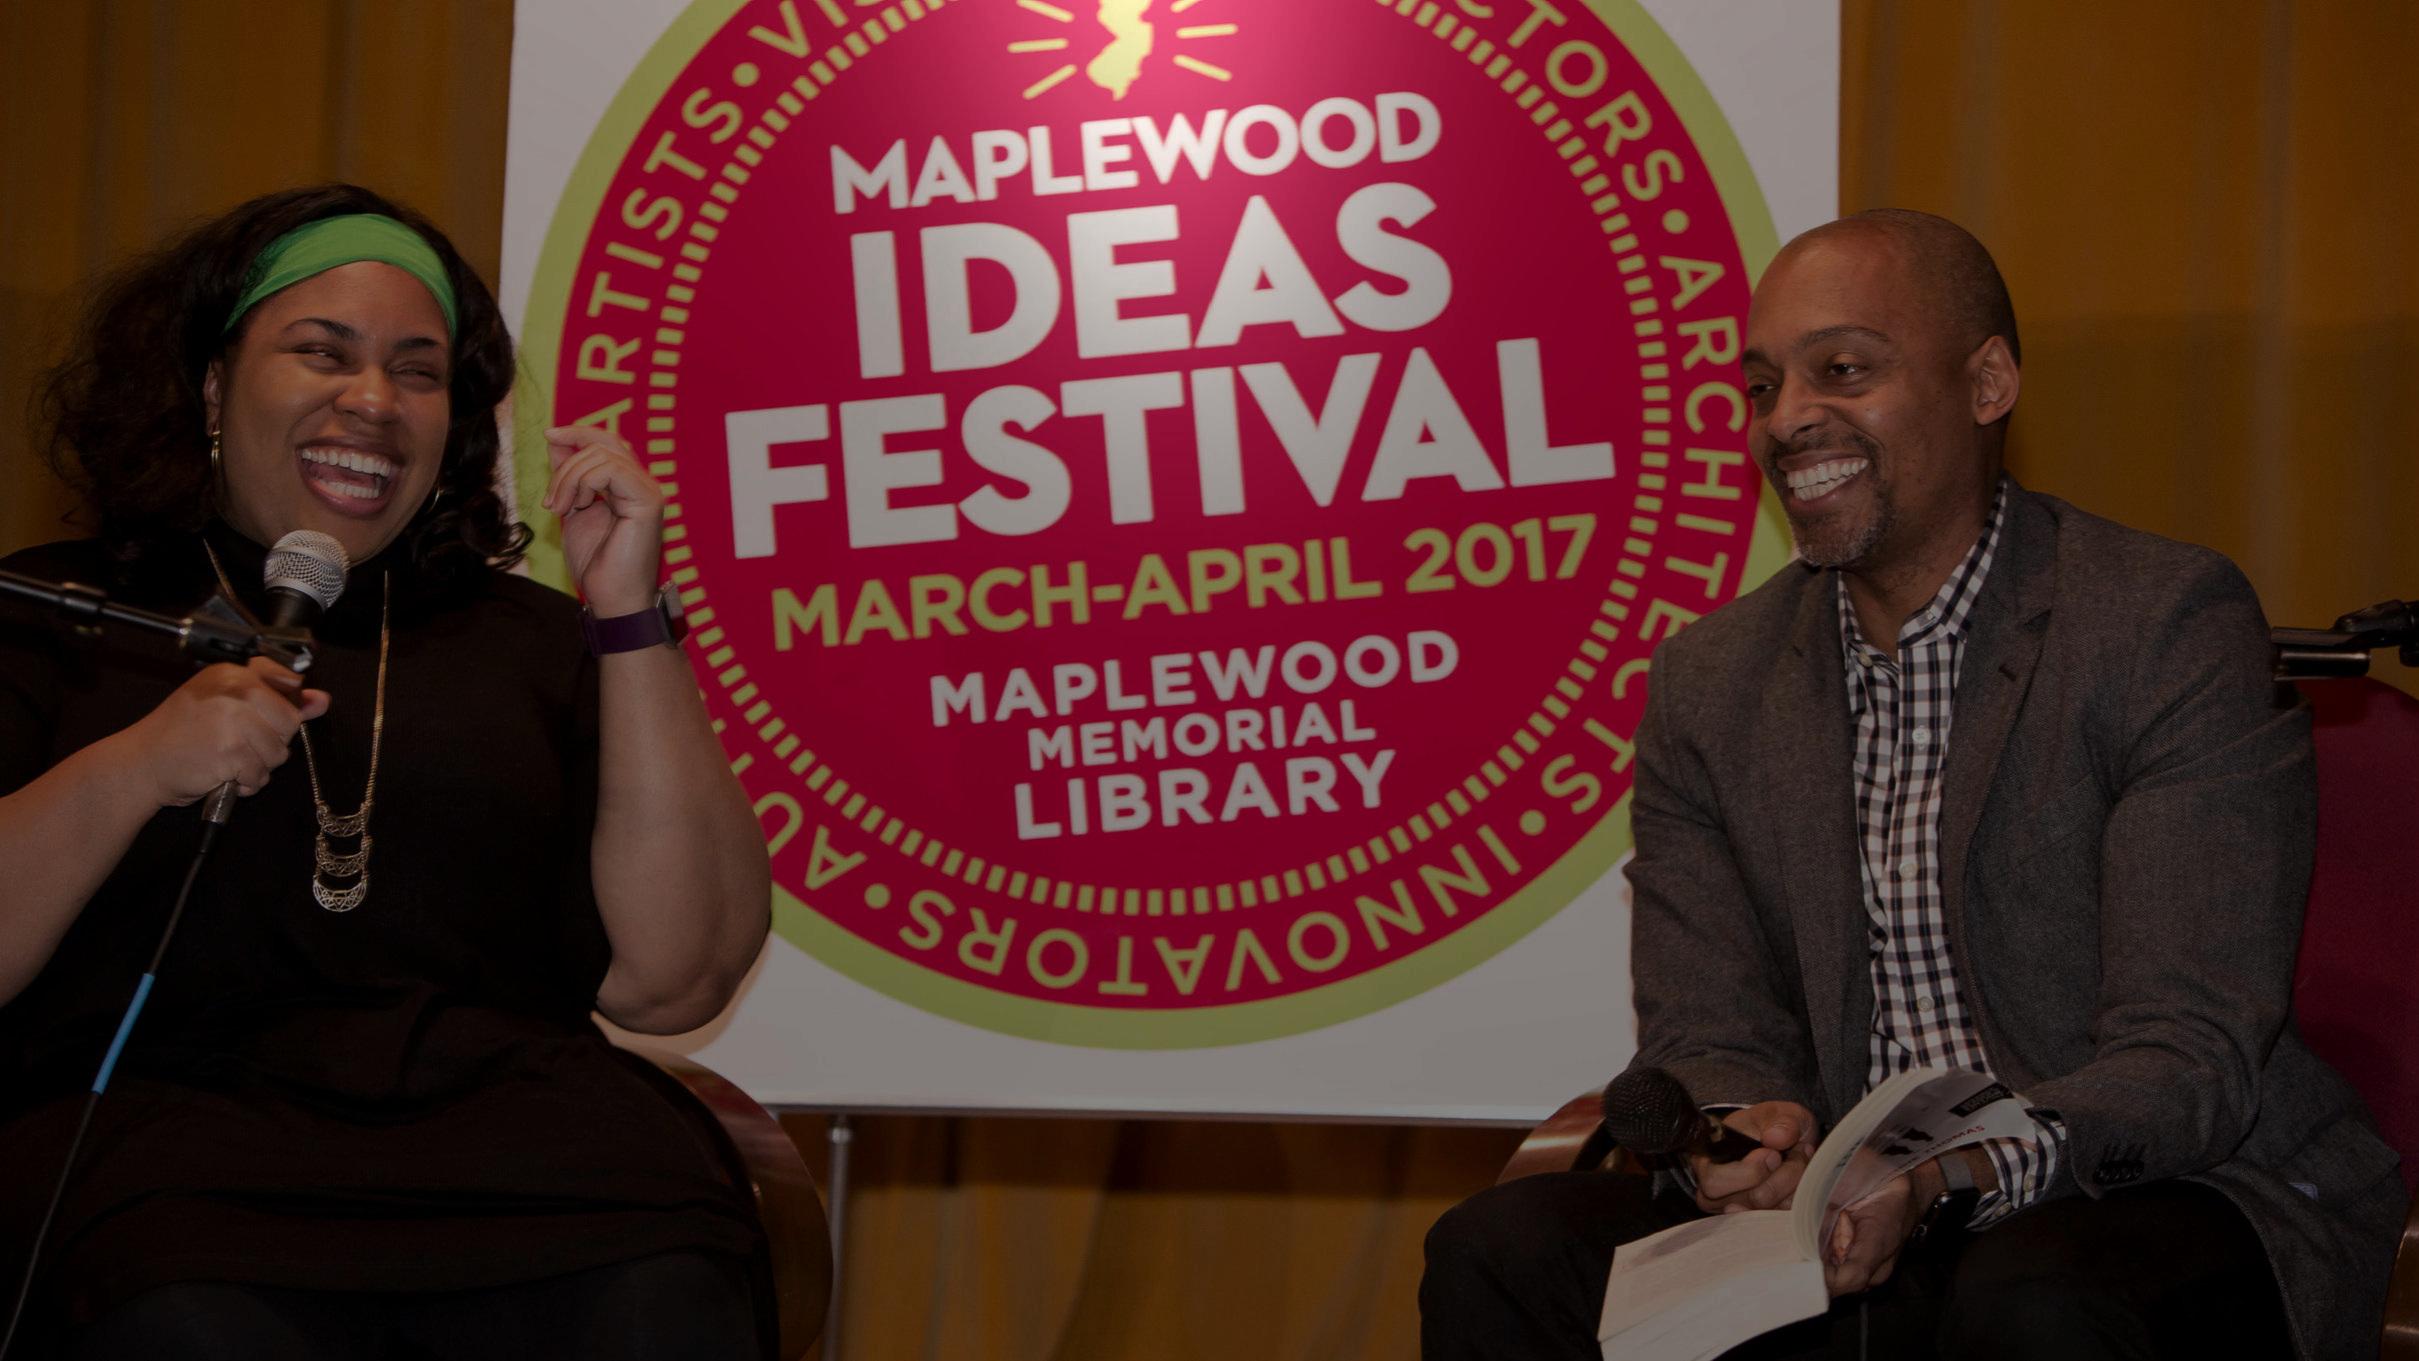 Ideas Festival - Archive